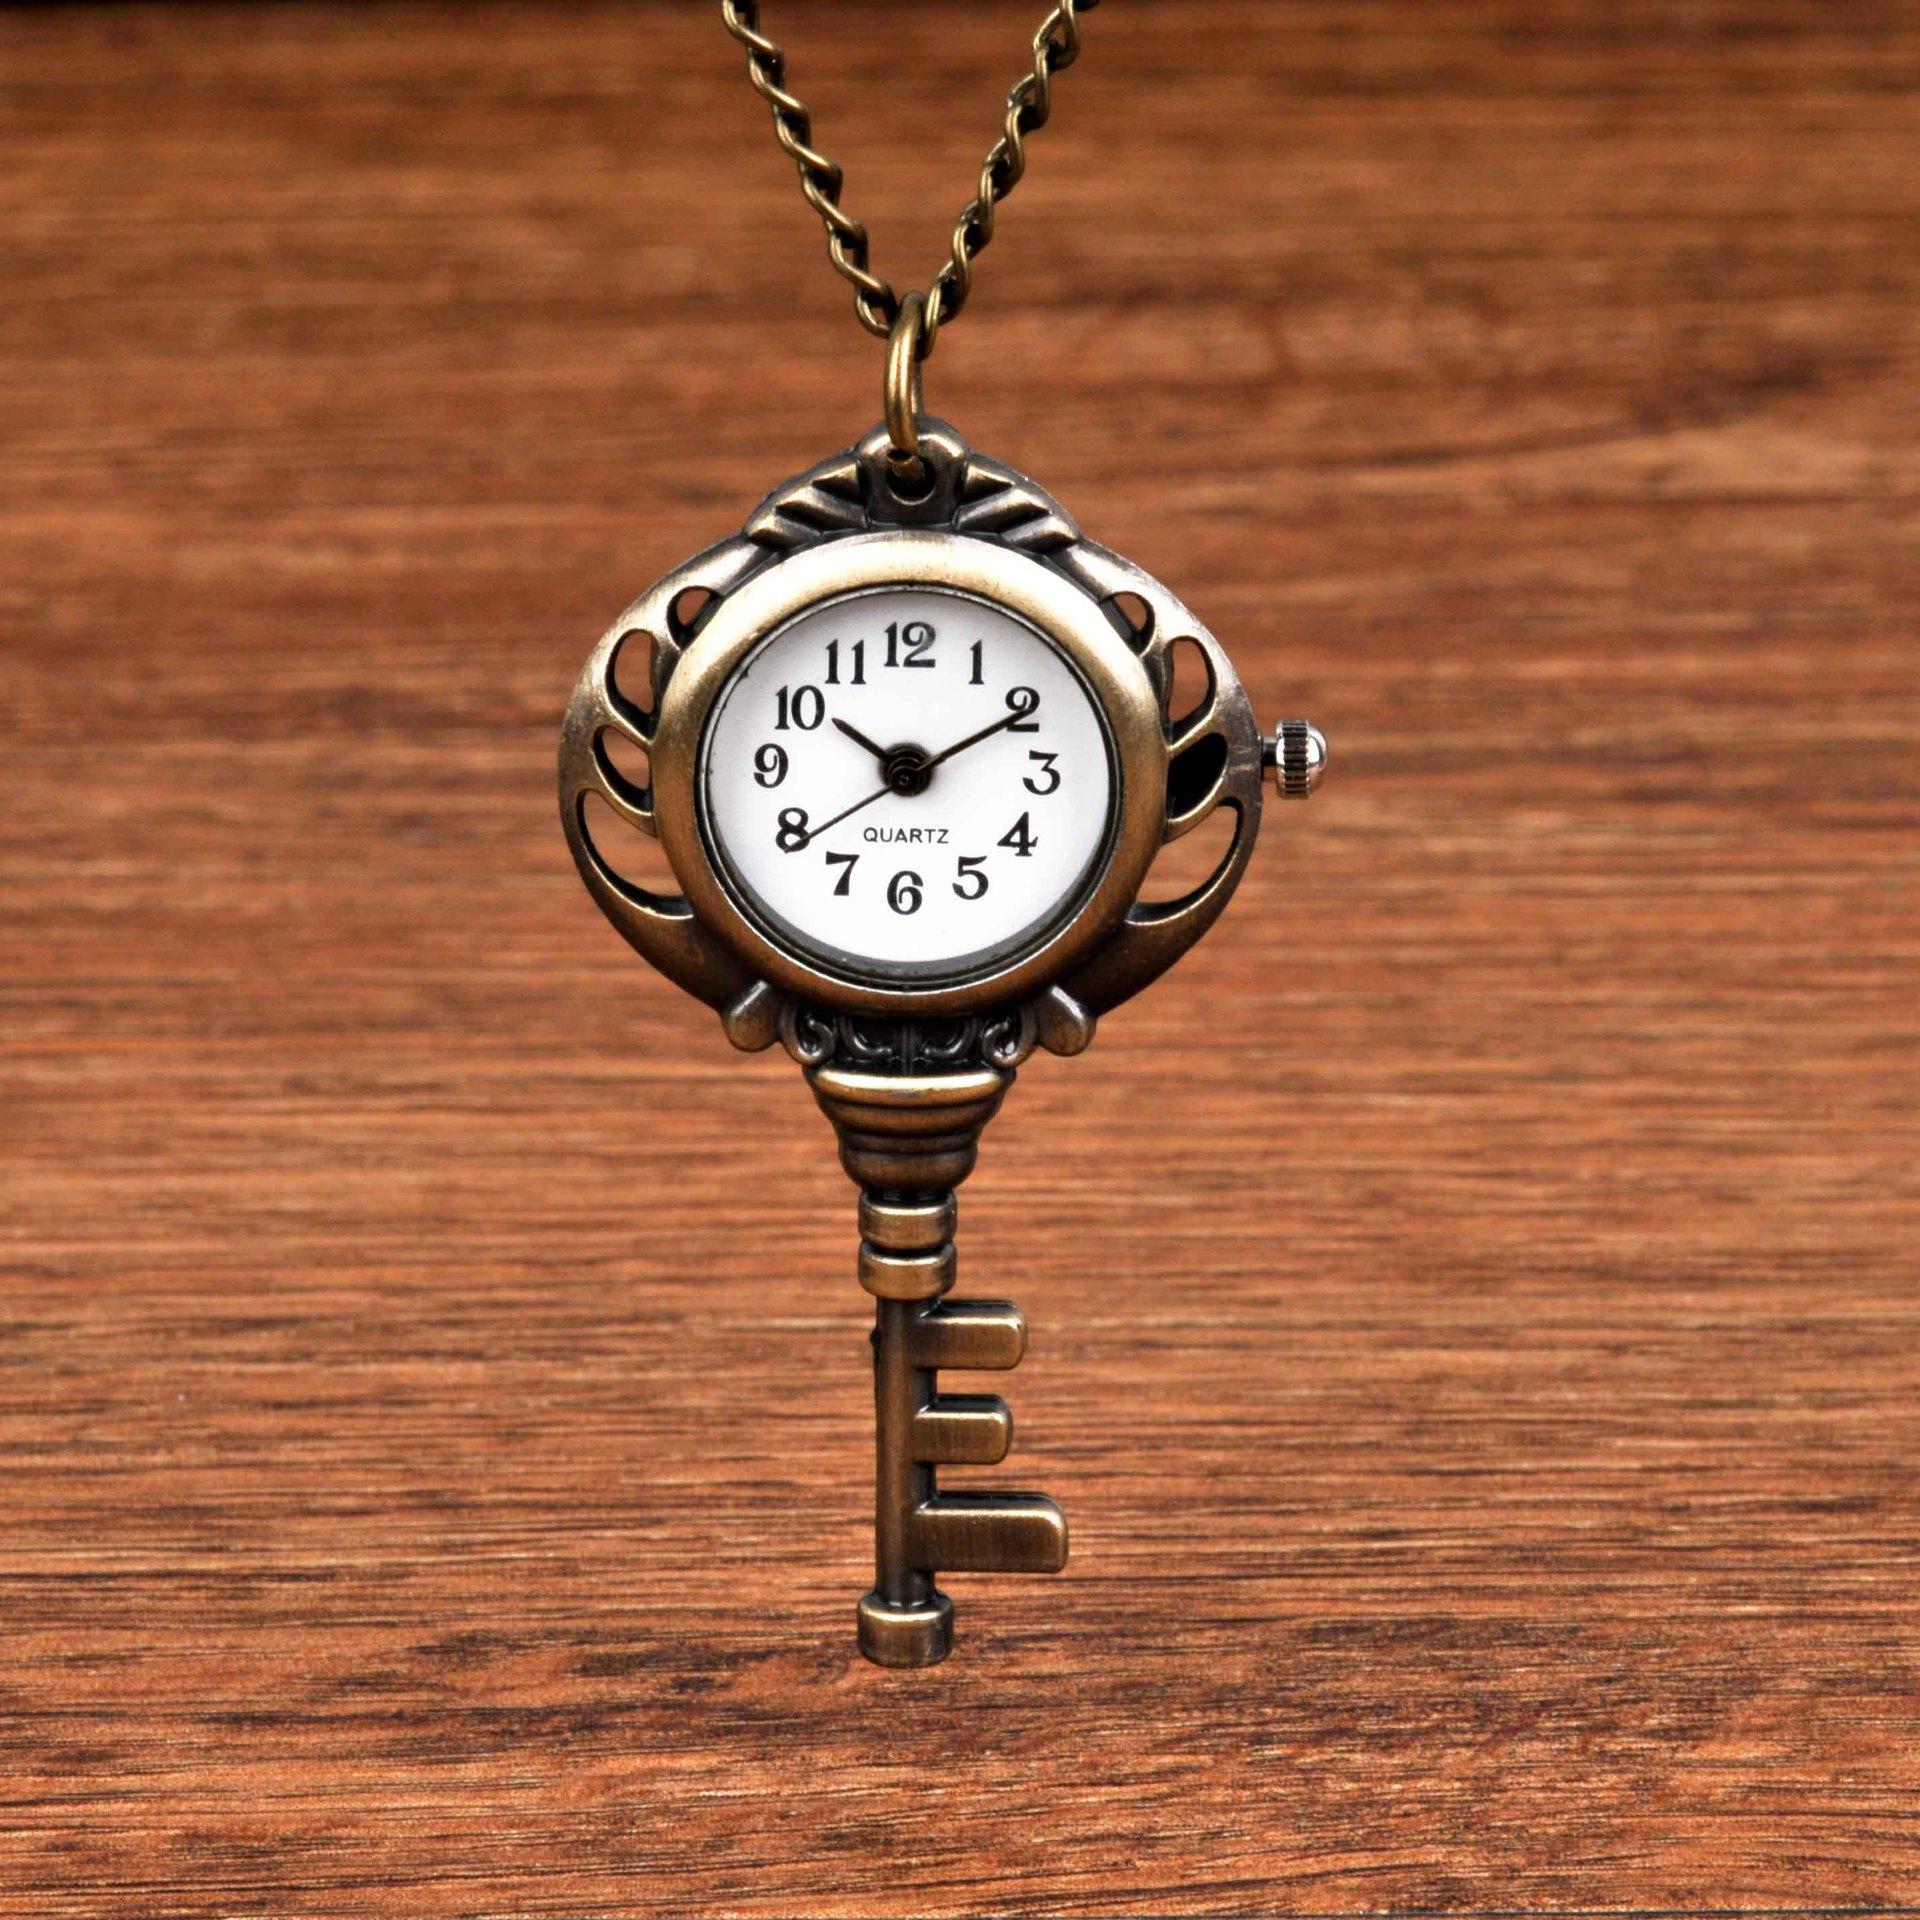 7053Small Quartz Pocket Watch Bronze Key Retro Personality Design Pocket Watch